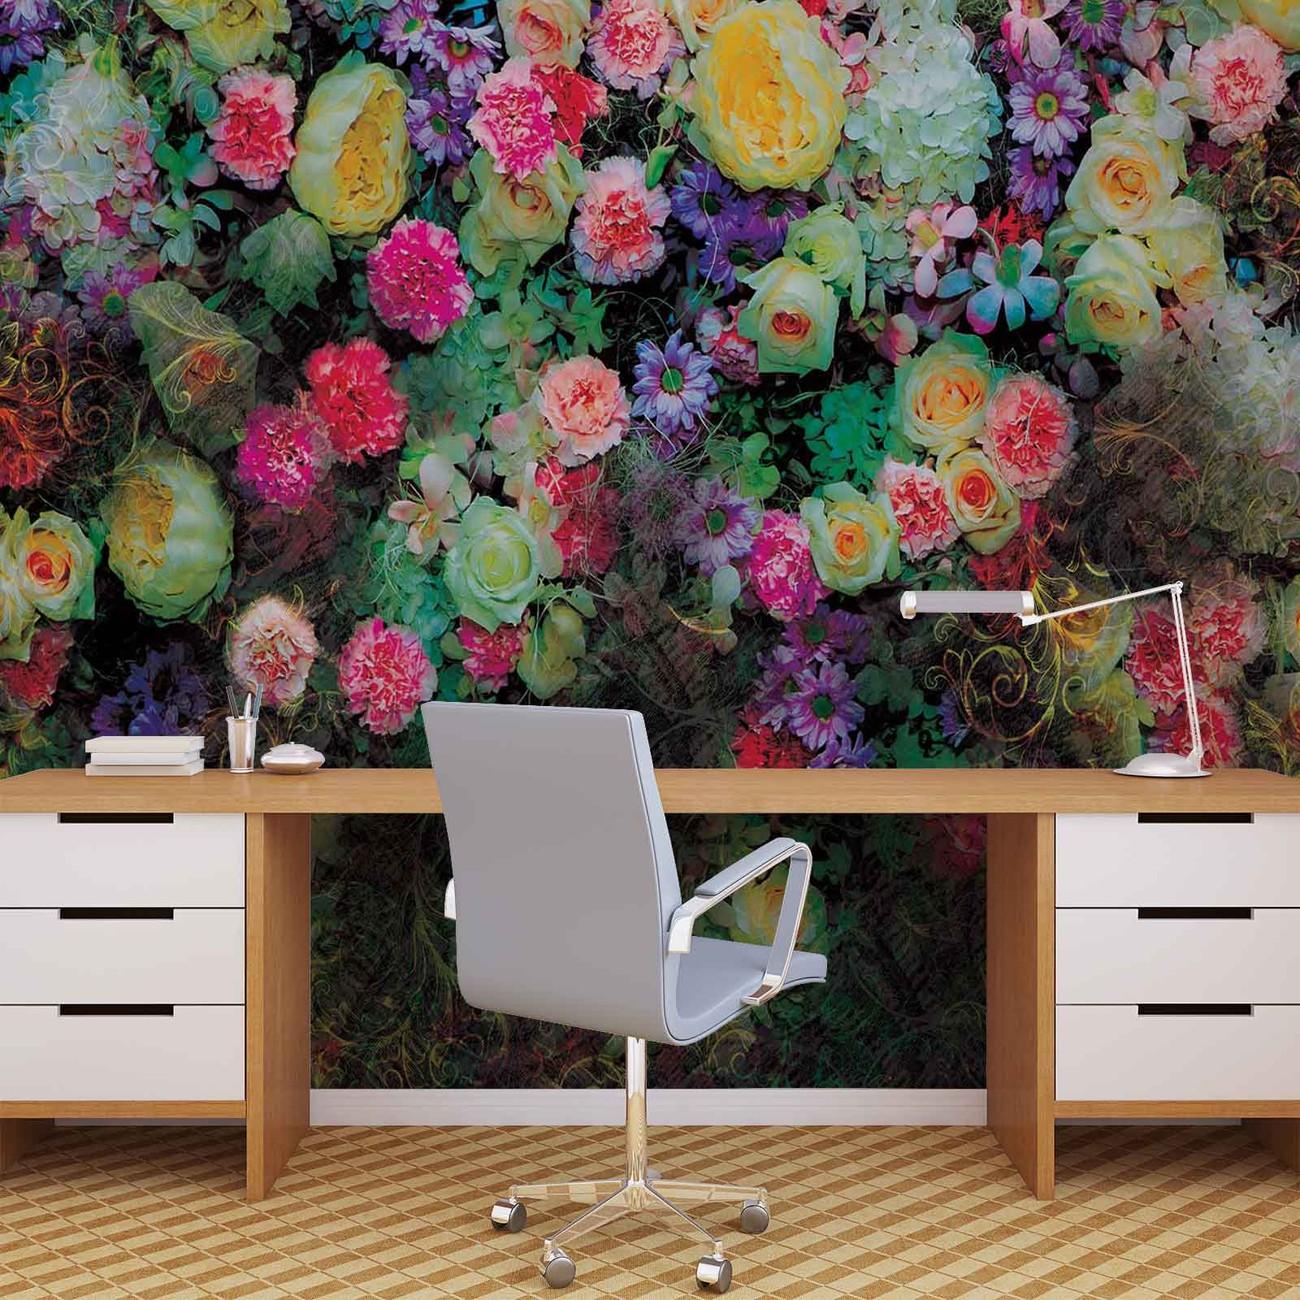 fototapete tapete blumen bunt design bei europosters. Black Bedroom Furniture Sets. Home Design Ideas